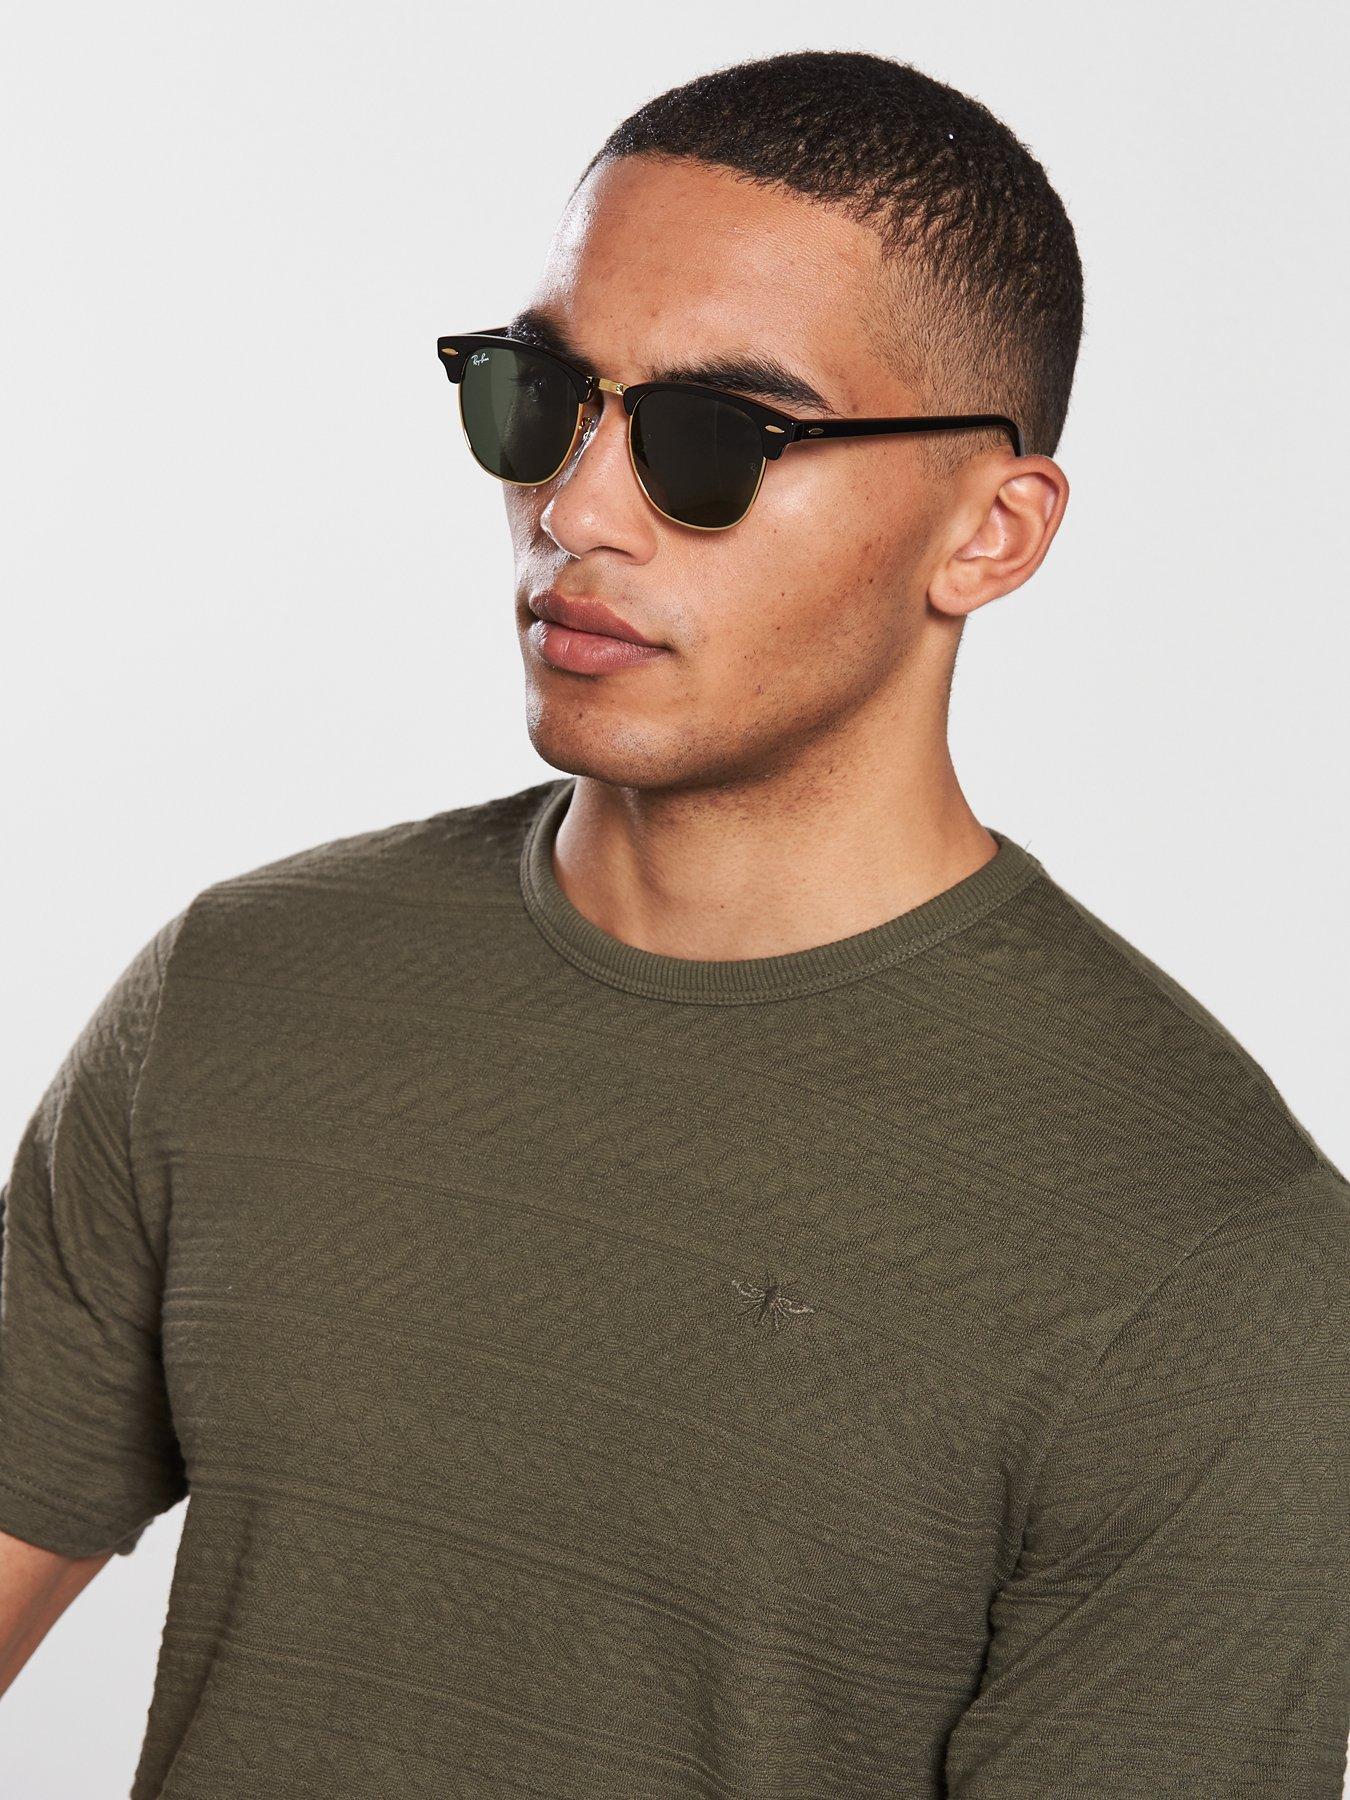 ray ban clubmaster sunglasses ireland  ray ban rayban clubmaster sunglasses